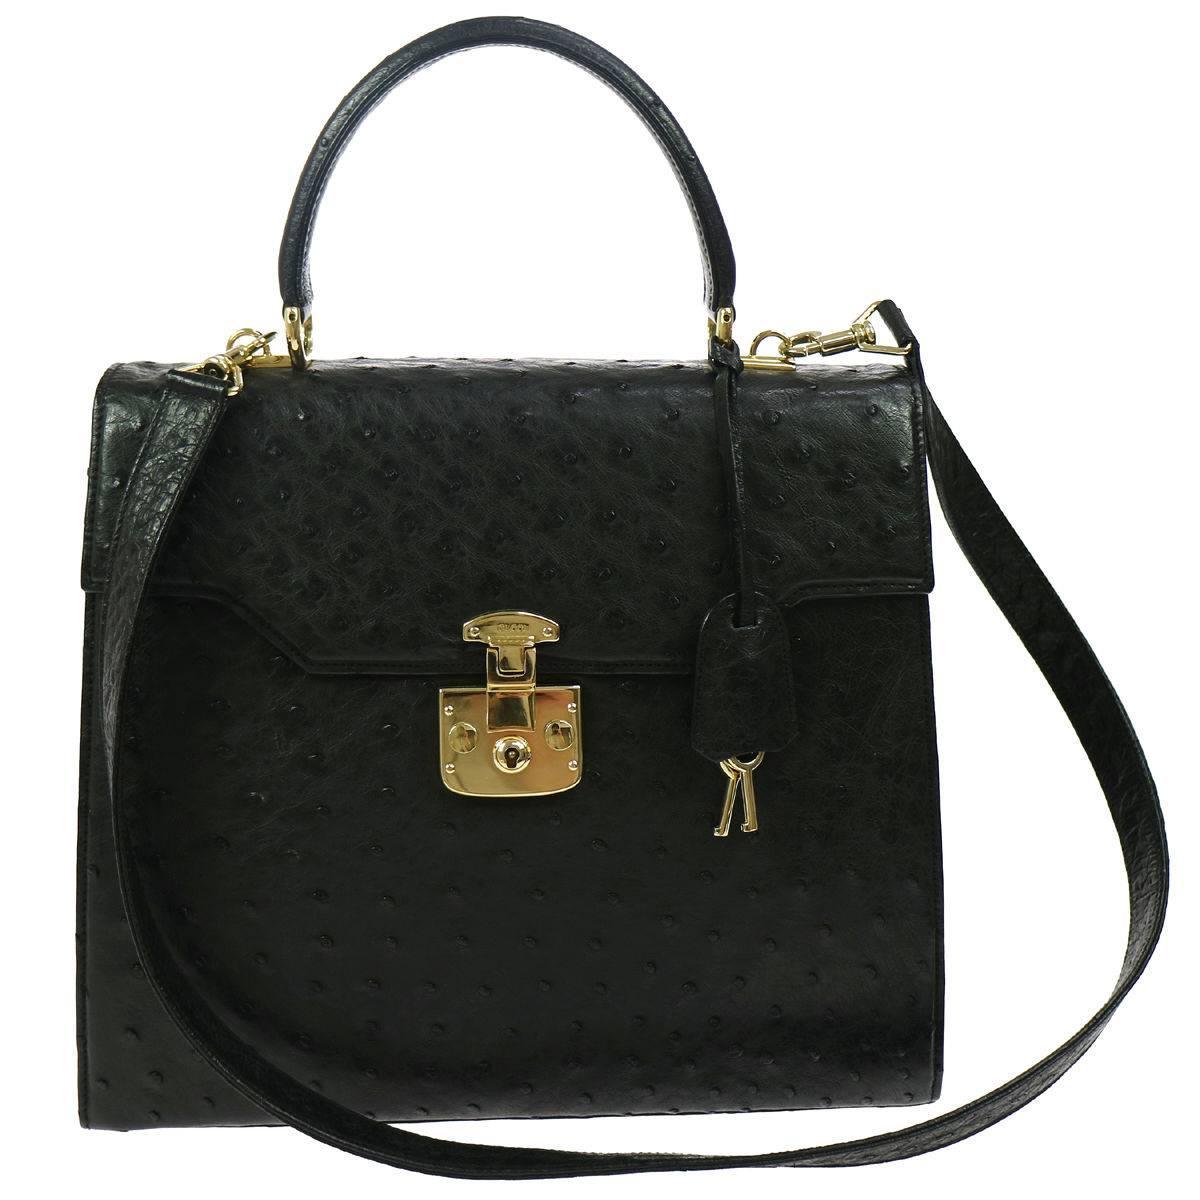 Gucci Black Ostrich Evening Kelly Style Top Handle Satchel Shoulder Bag K7qI84o